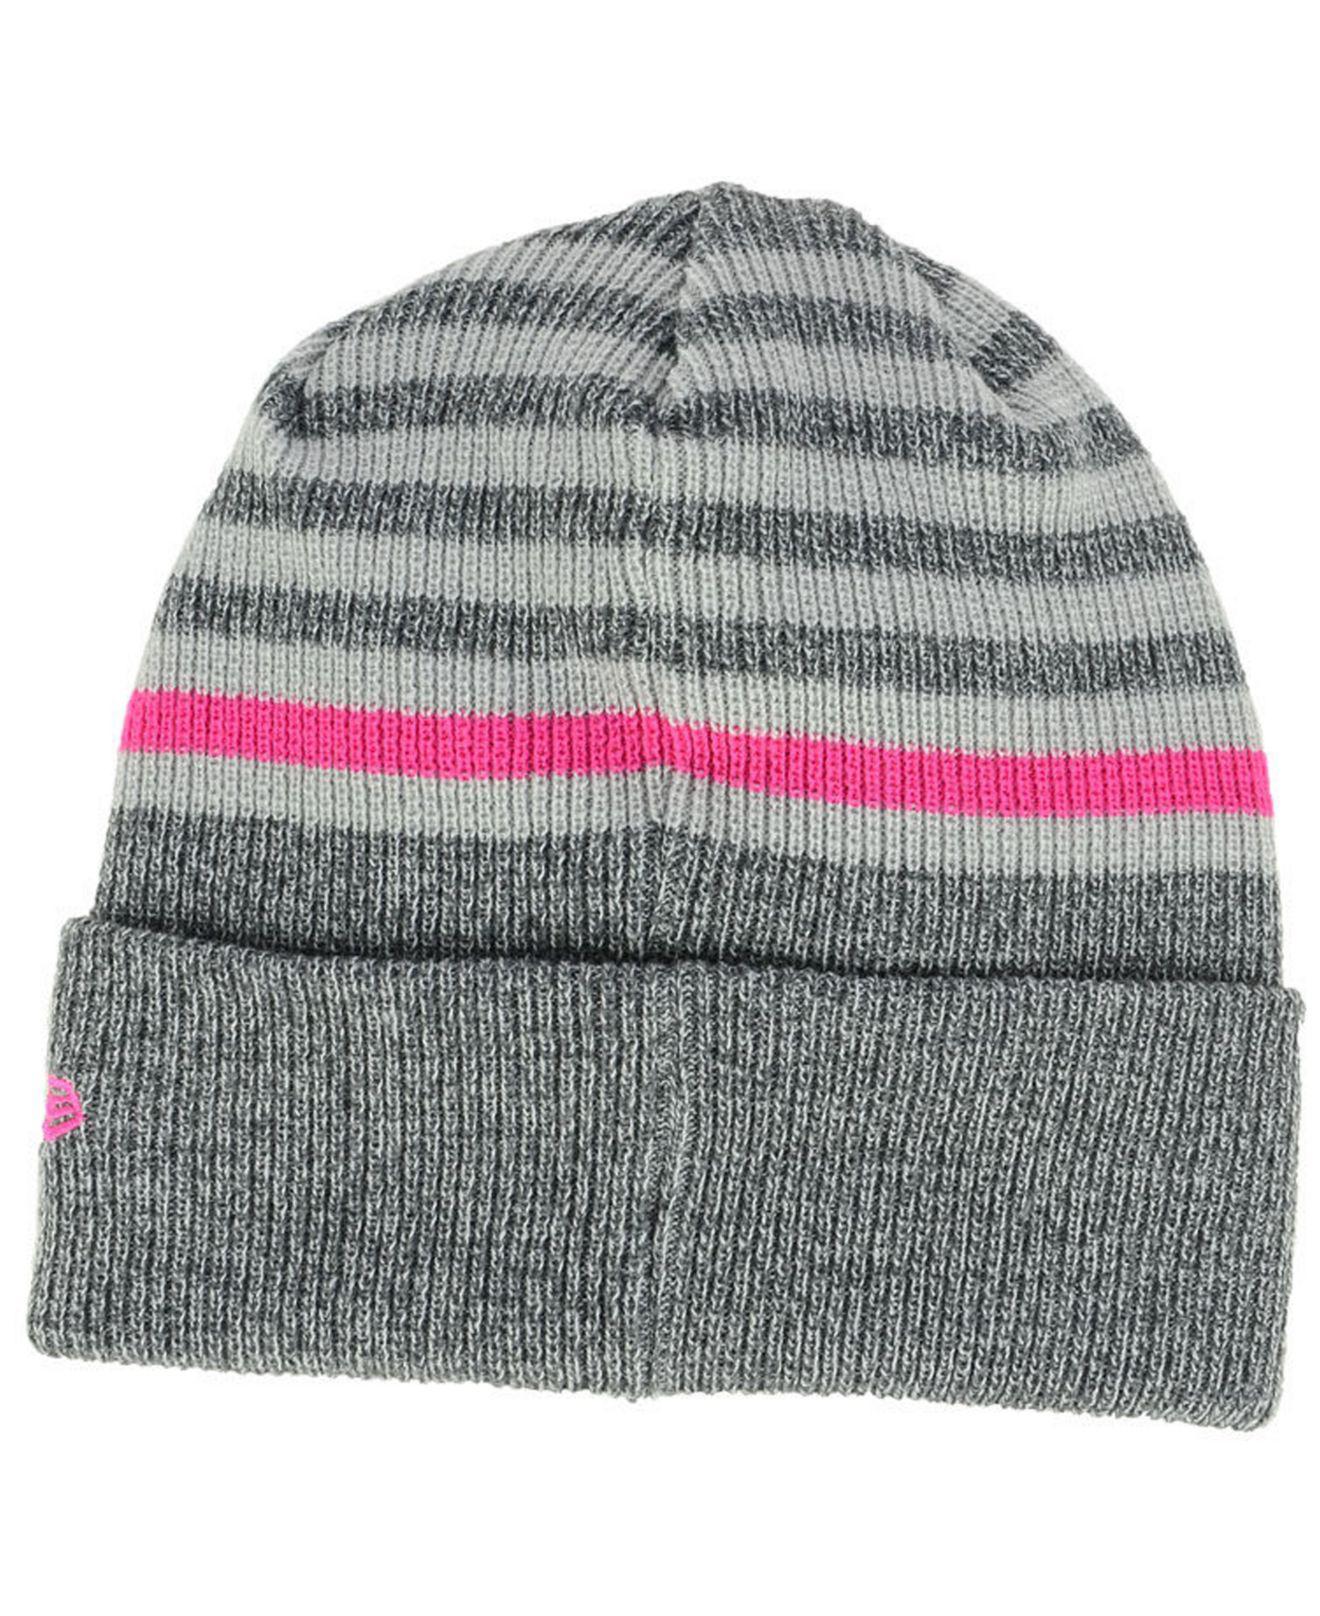 quality design 95ca6 06cc0 ... discount code for lyst ktz houston rockets striped cuff knit hat in  gray 21f5c bb5f5